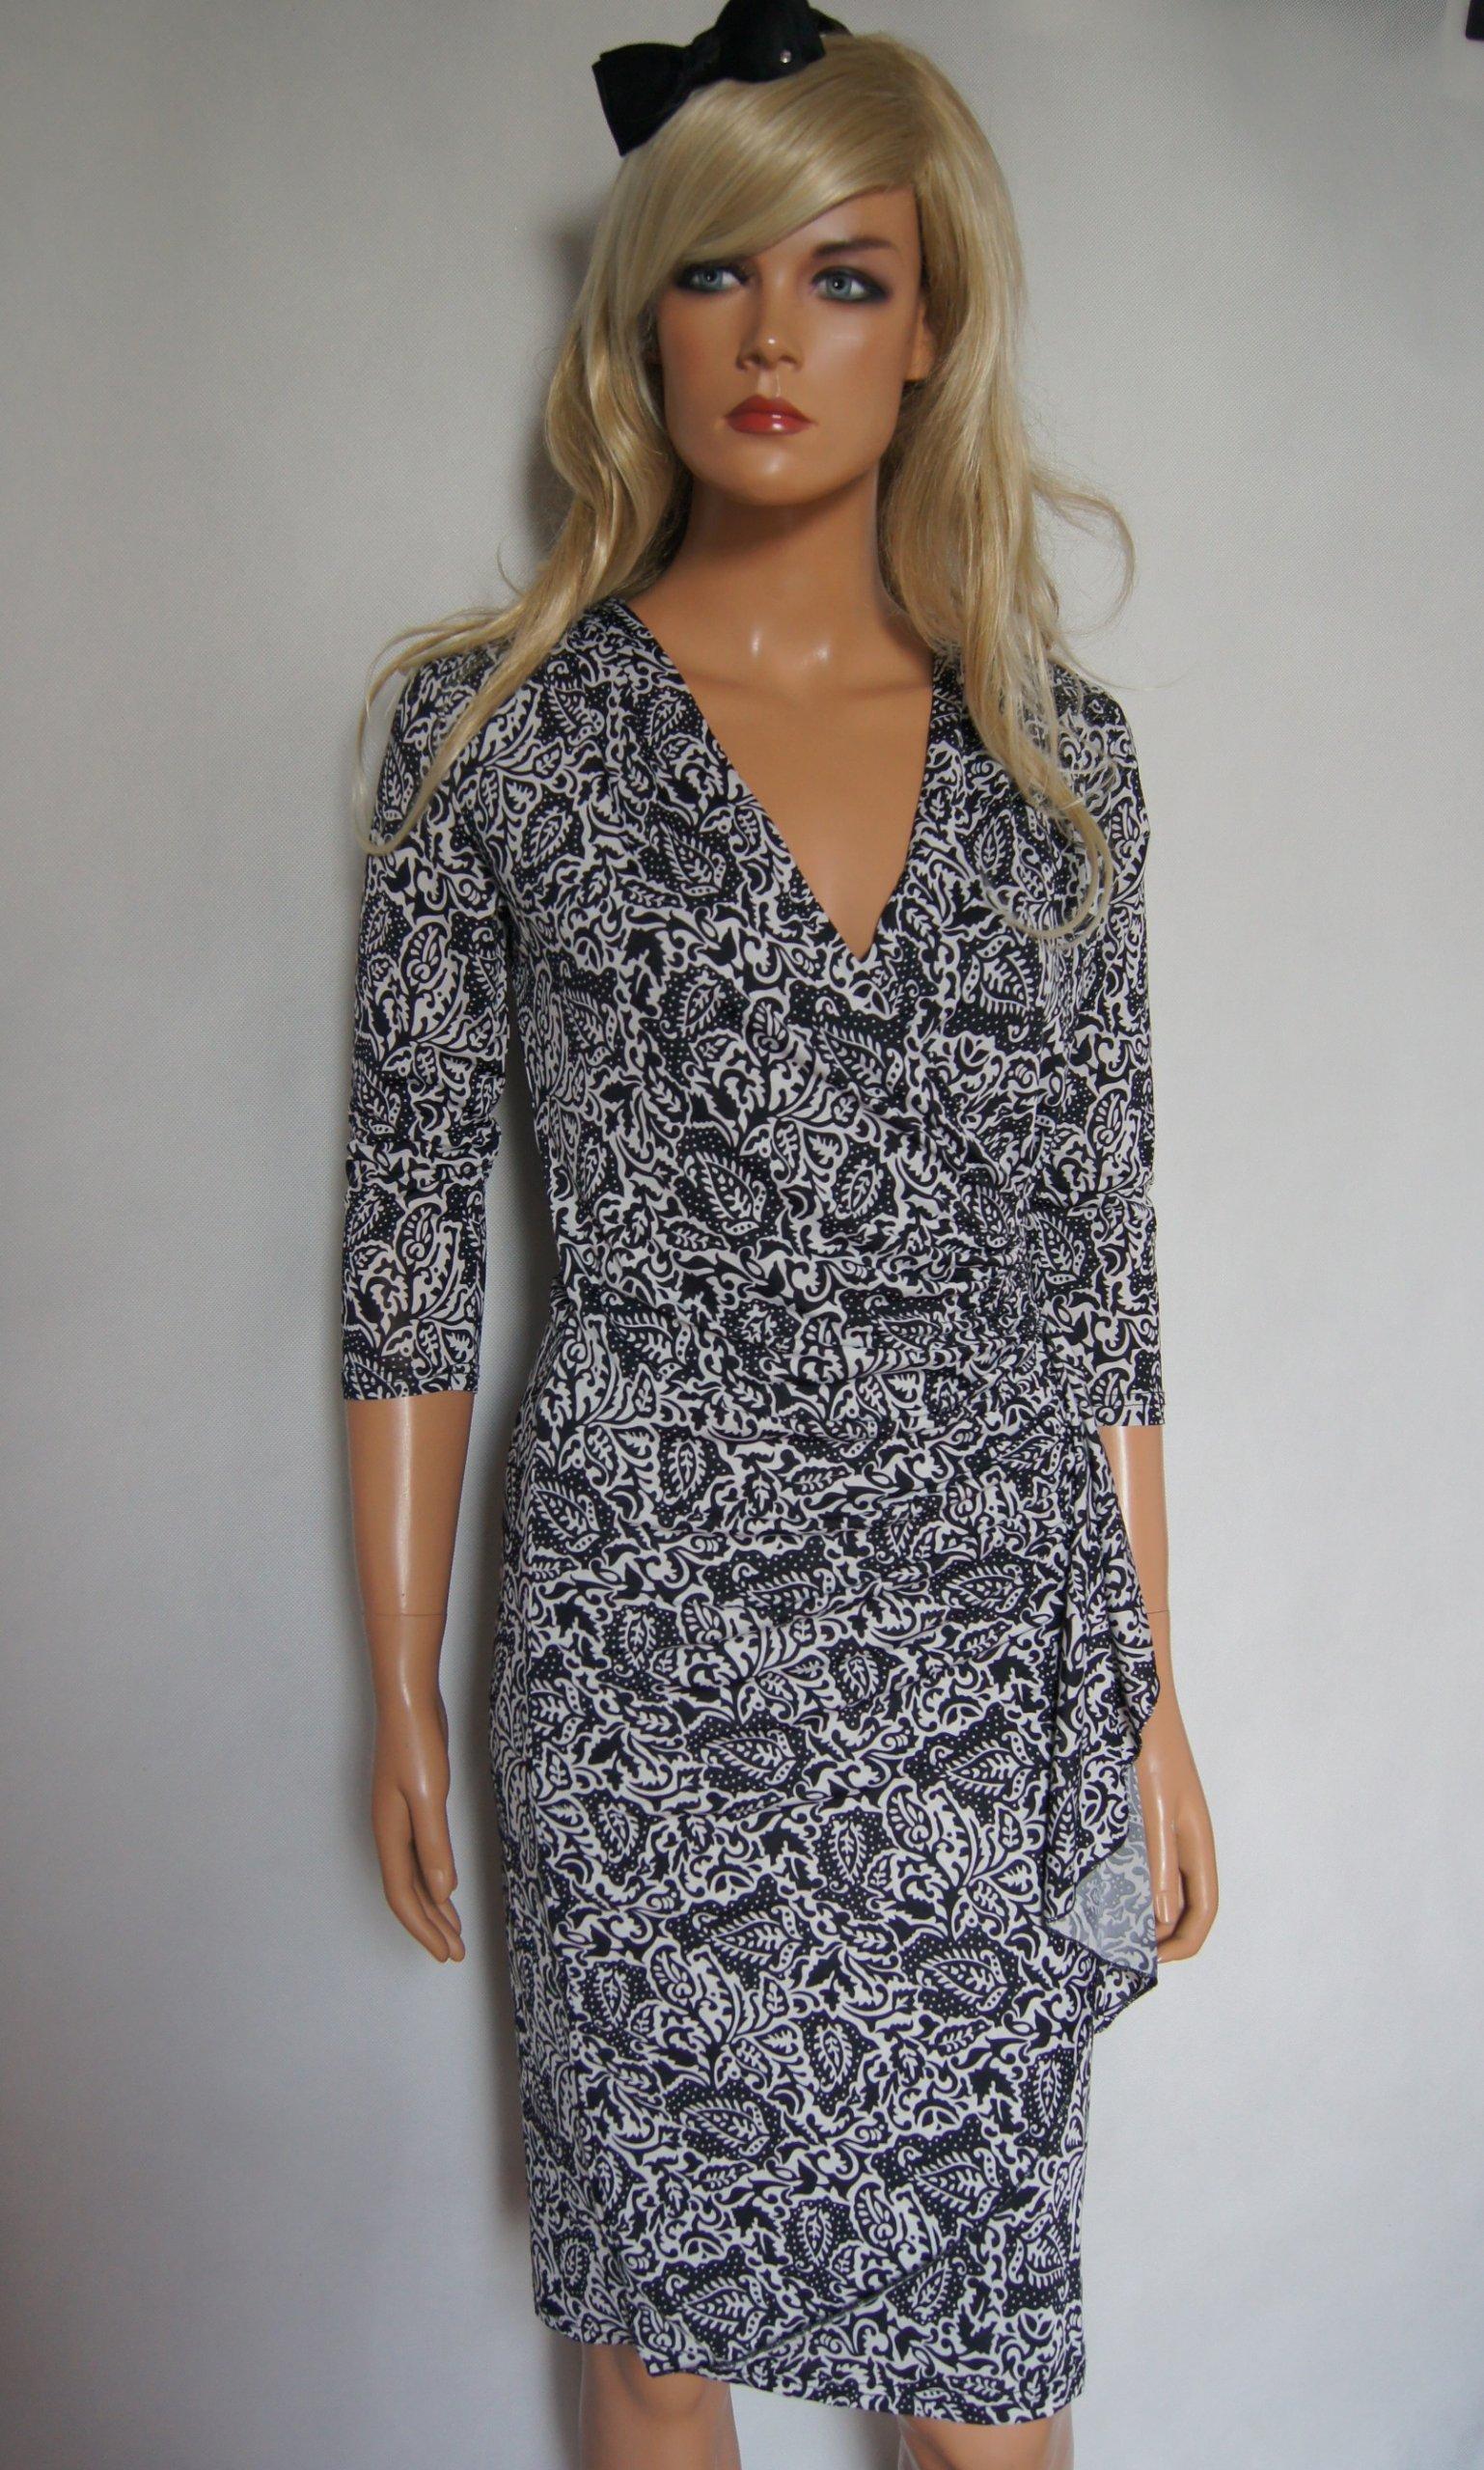 77f2410be1 Czarno biała sukienka wzorek MORGAN r 36 NOWA - 7132280019 ...